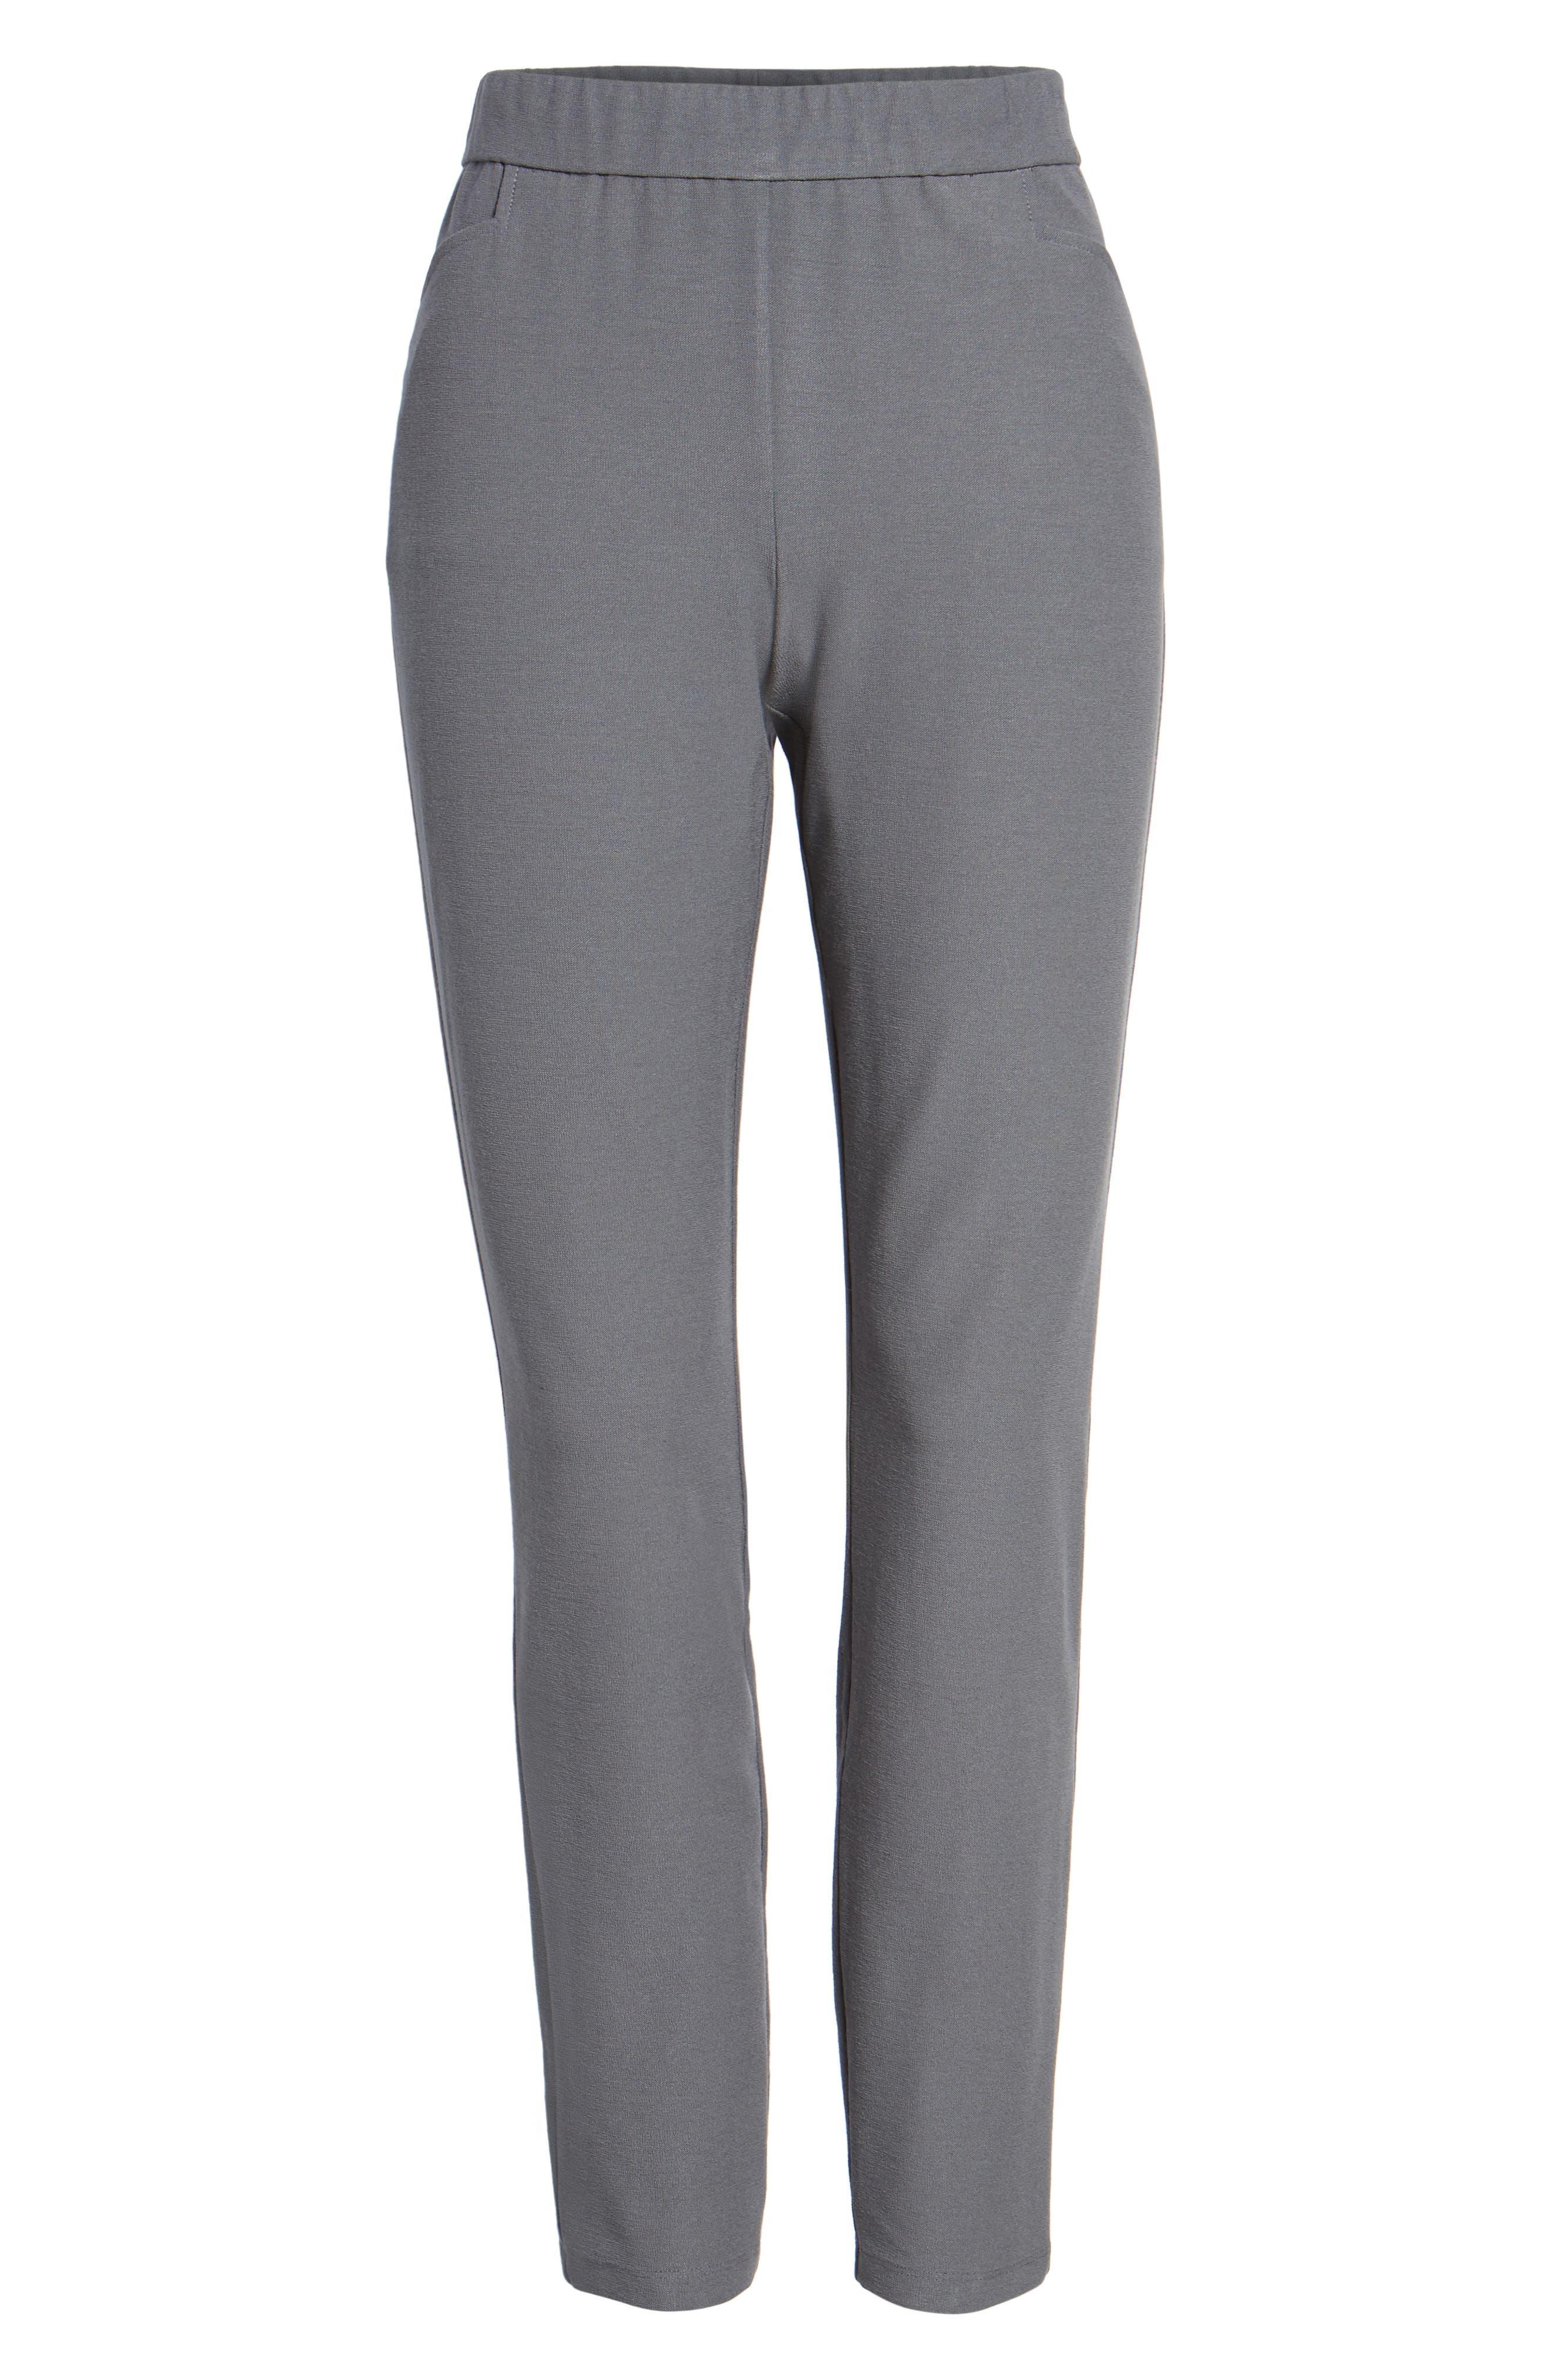 Slim Knit Pants,                             Alternate thumbnail 5, color,                             Ash